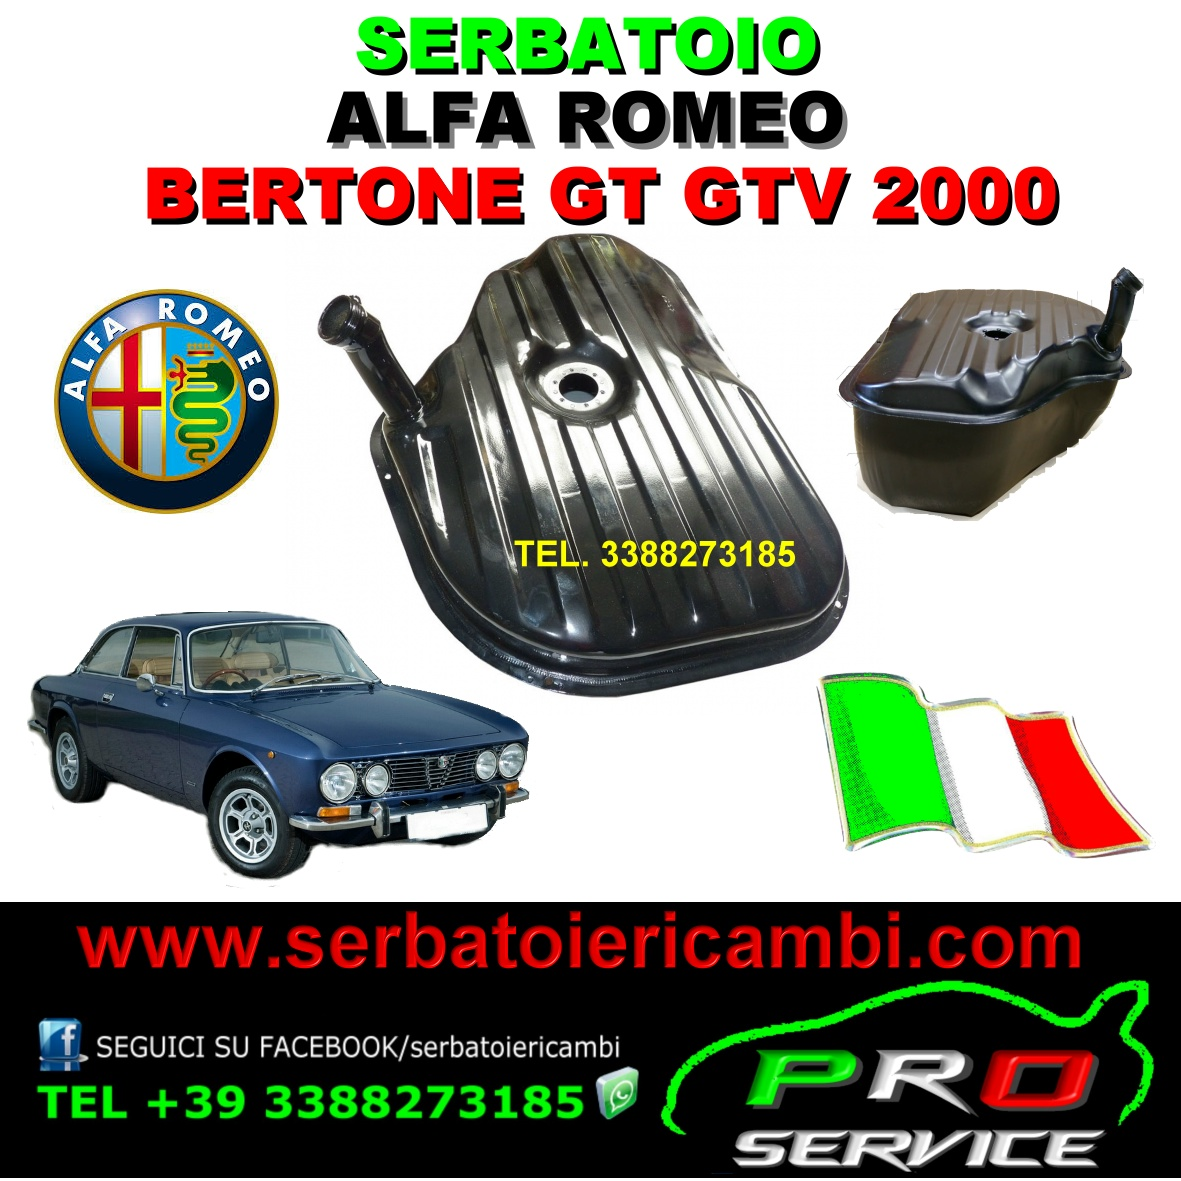 Serbatoio Alfa Romeo GIULIA GT GTV 2000 BERTONE 1967-1974